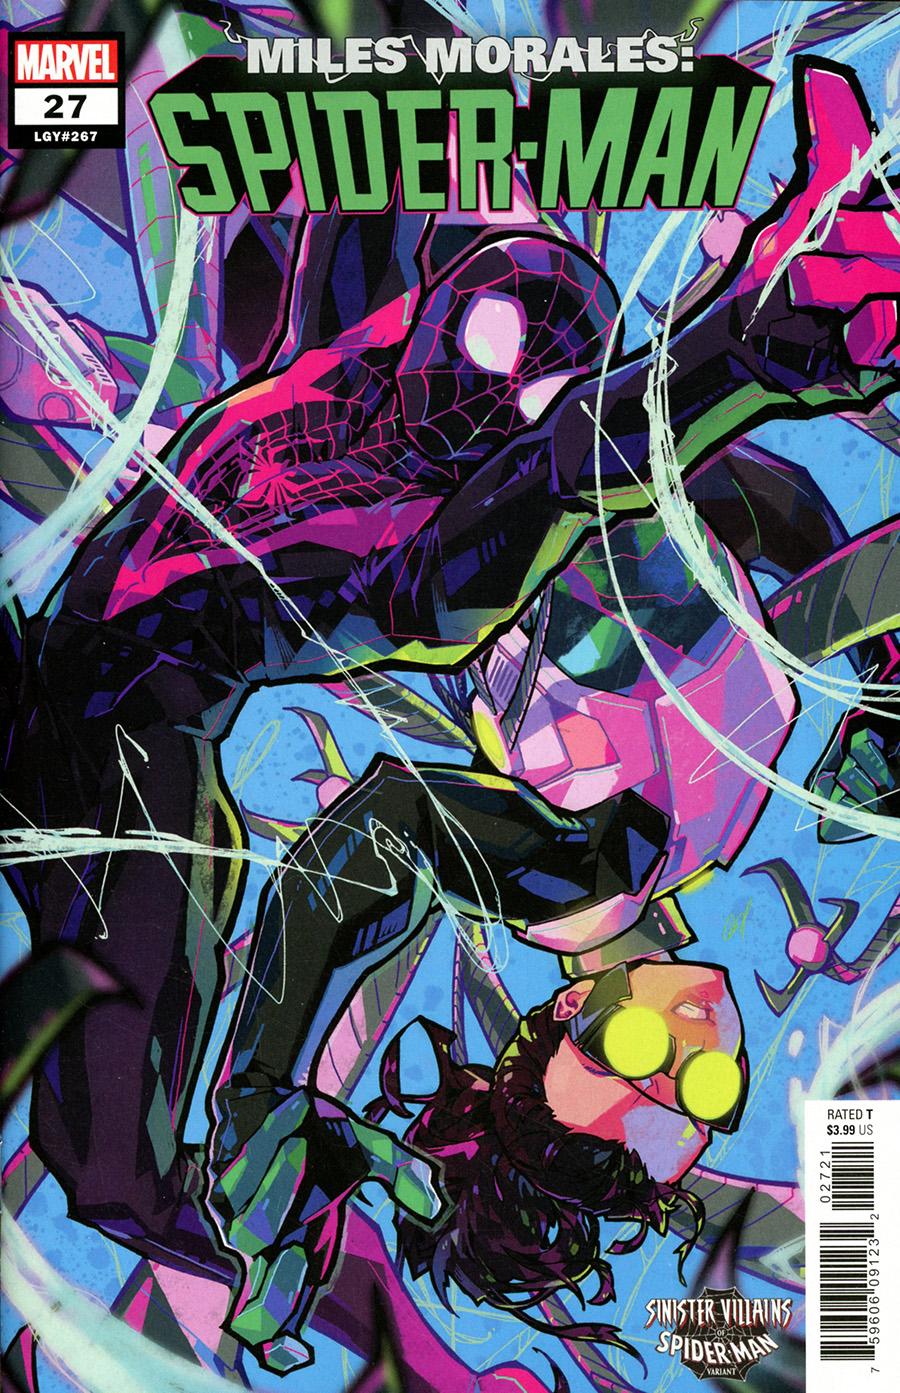 Miles Morales Spider-Man #27 Cover B Variant Rose Besch Spider-Man Villains Cover